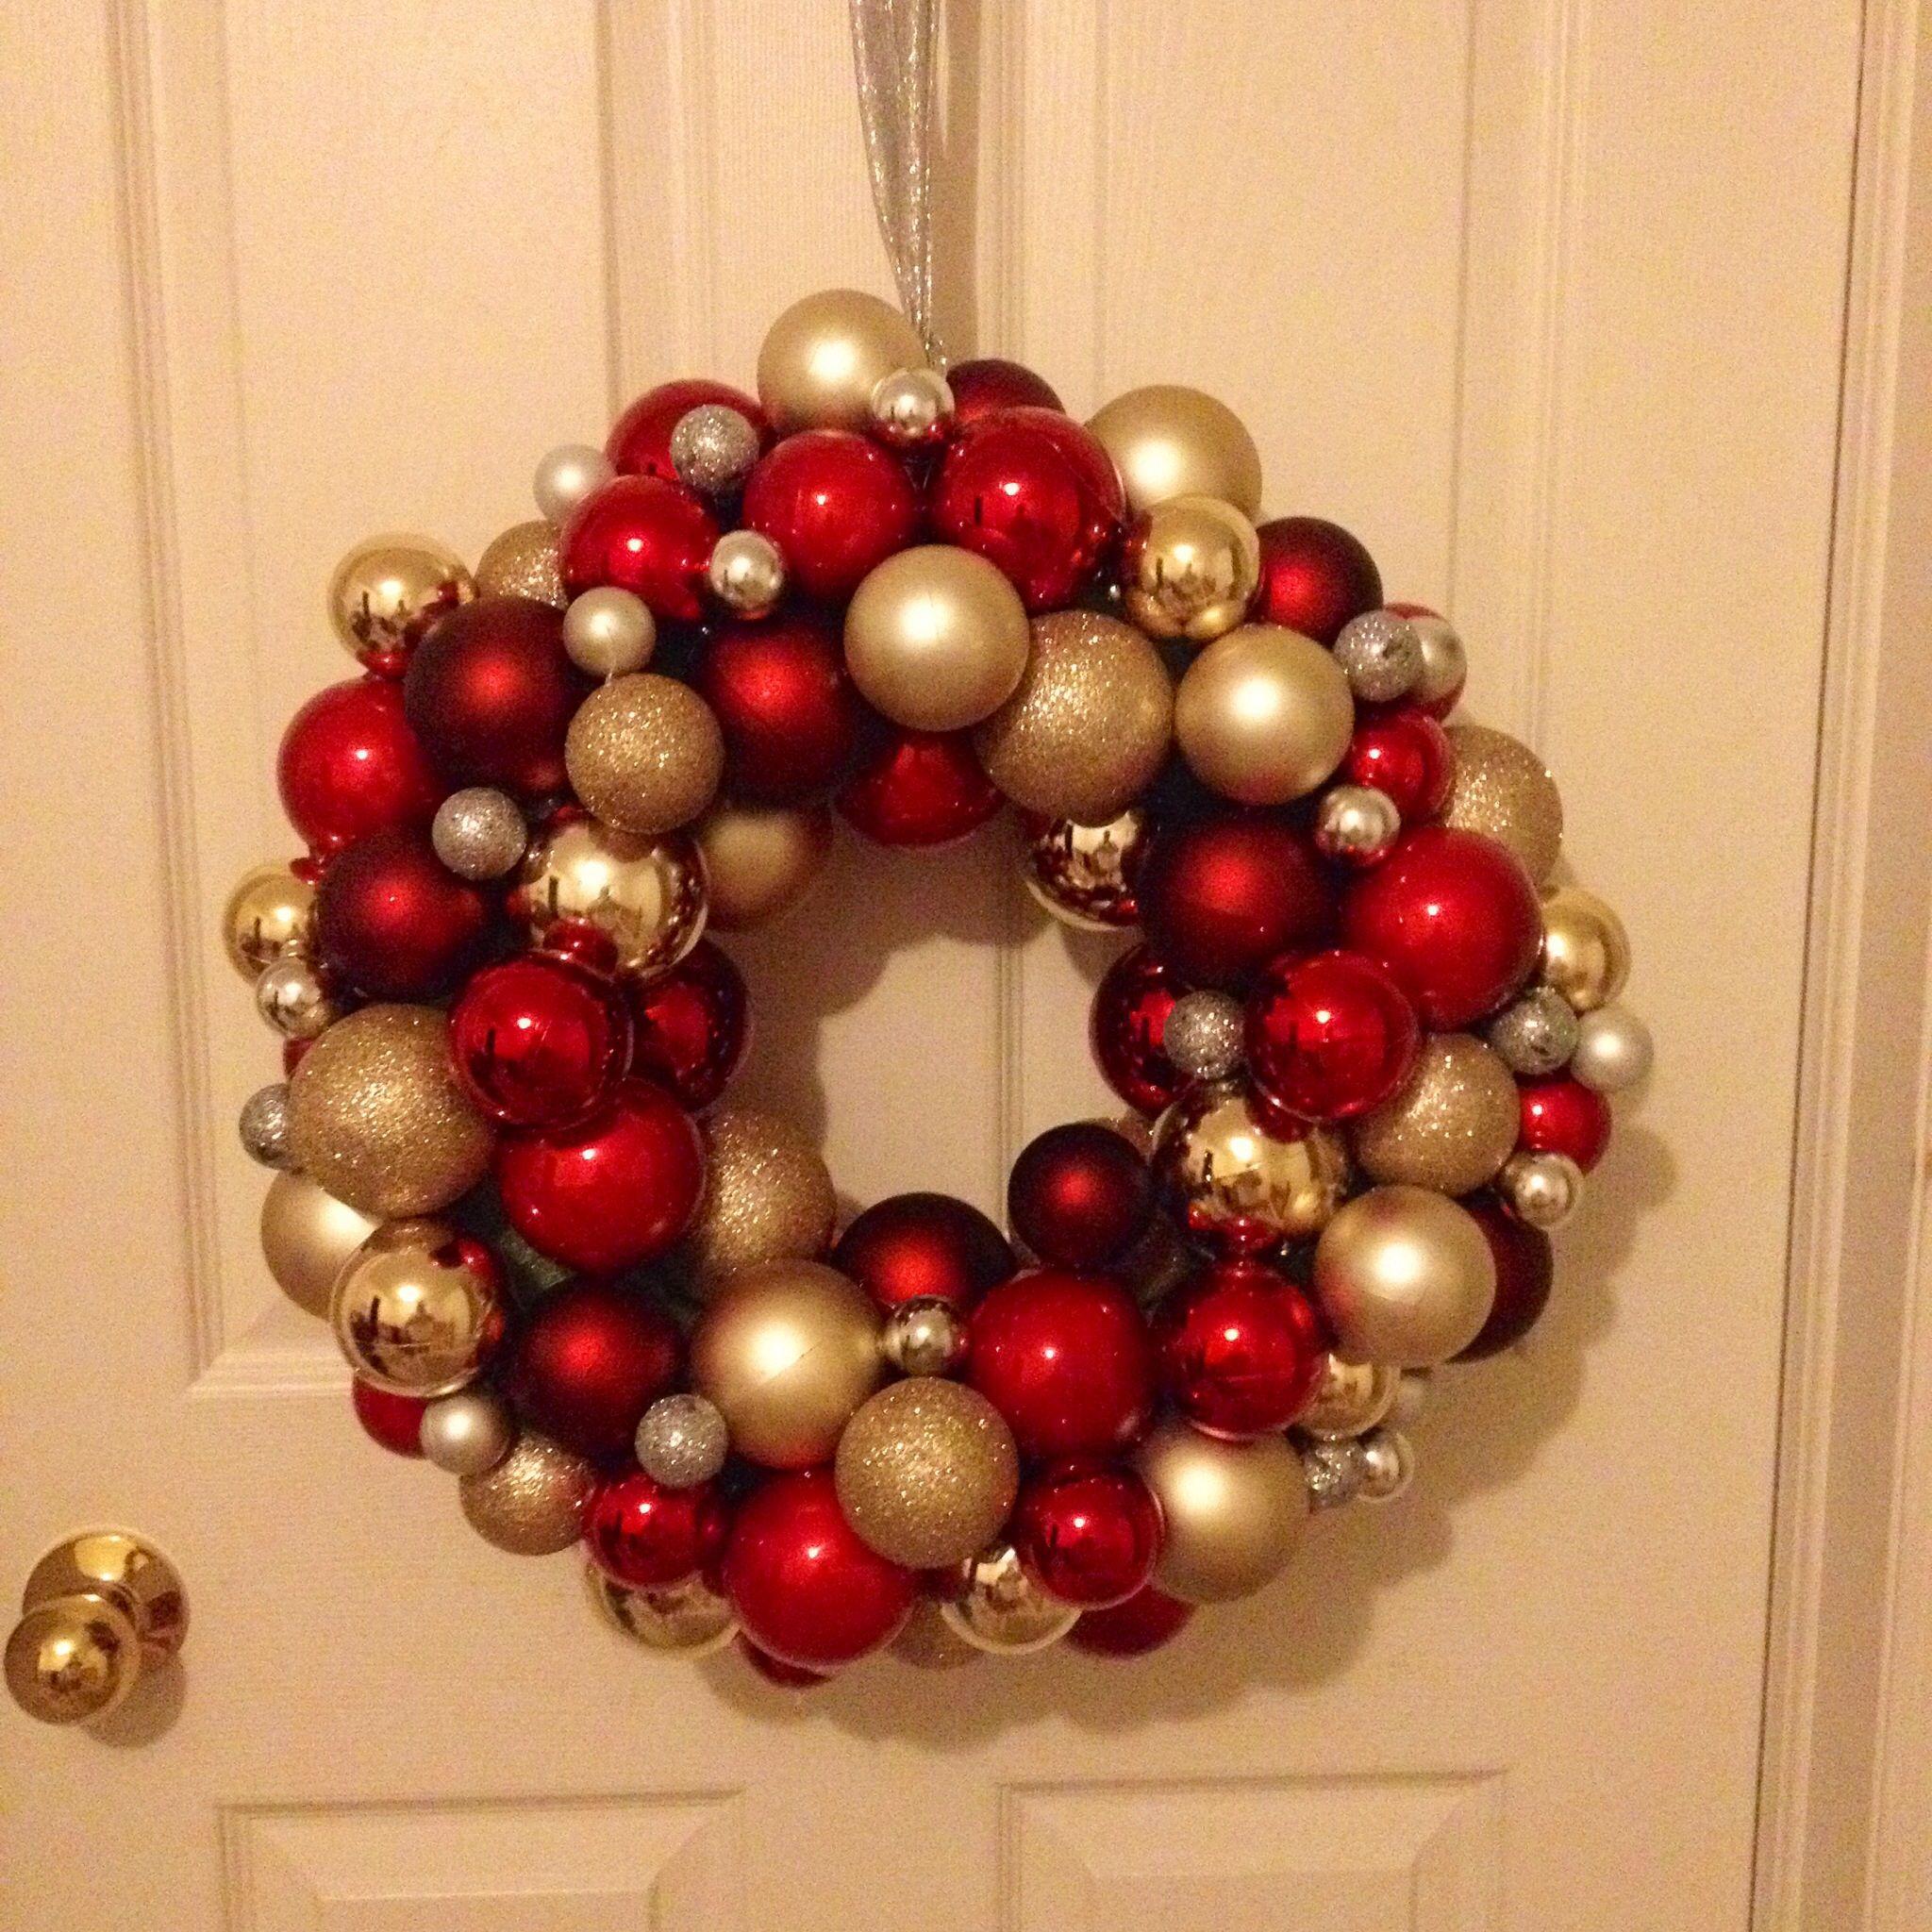 Loblaws Christmas Decorations: So I Pinned A DIY Christmas Ornament Wreath A Few Weeks